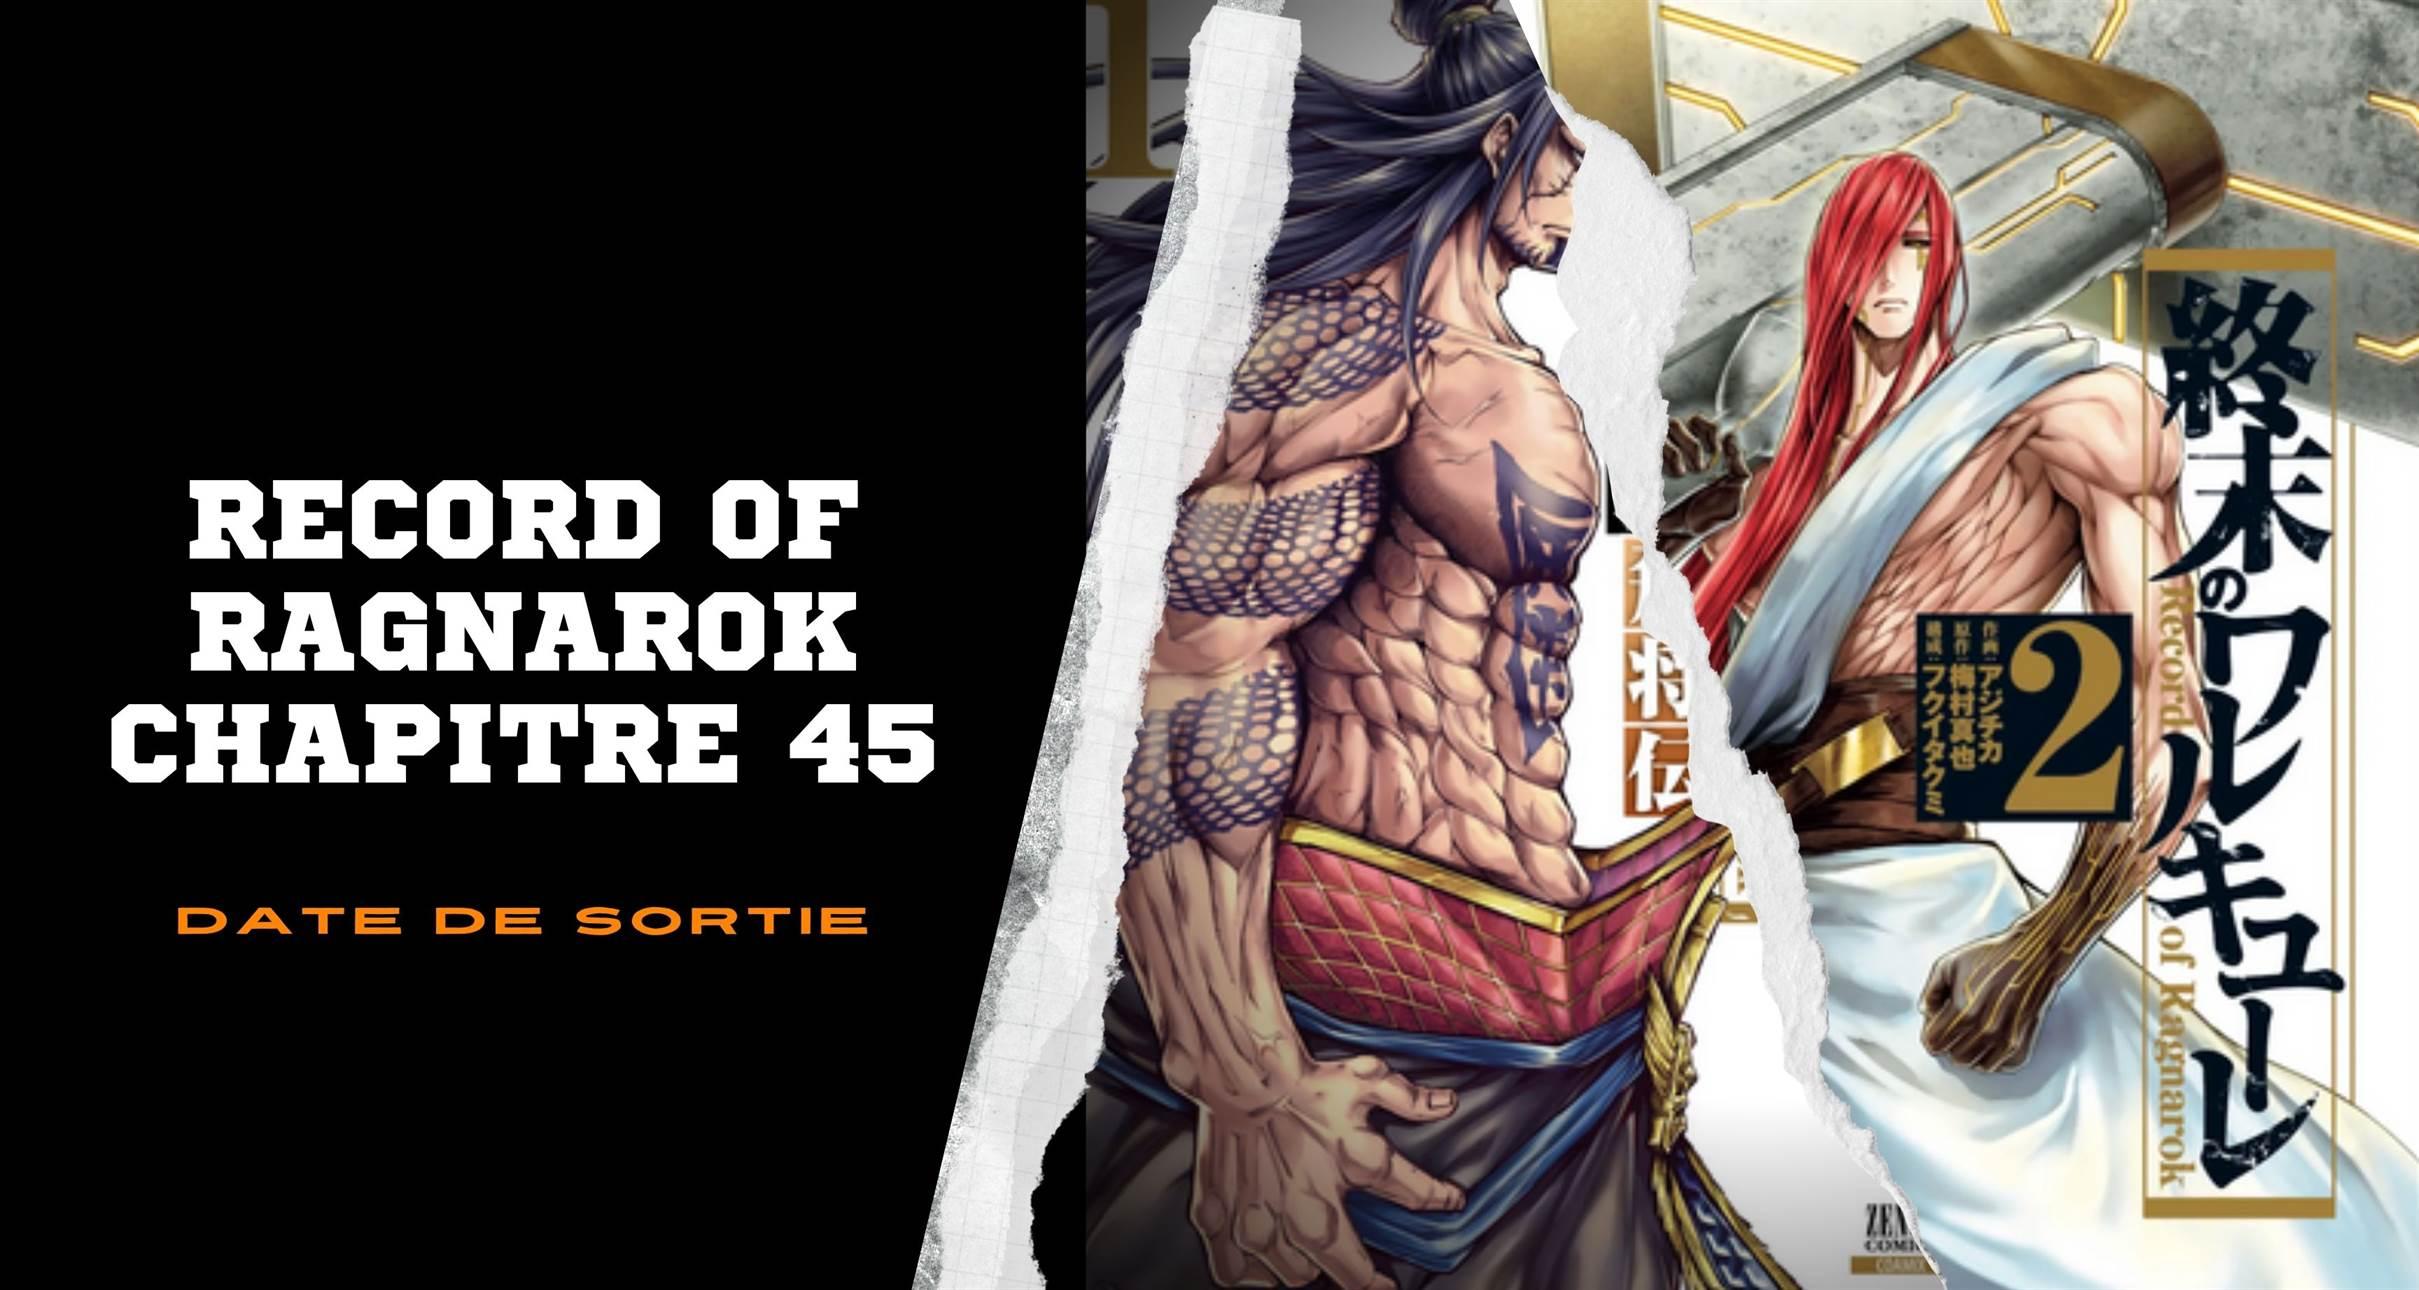 Record Of Ragnarok Chapitre 45